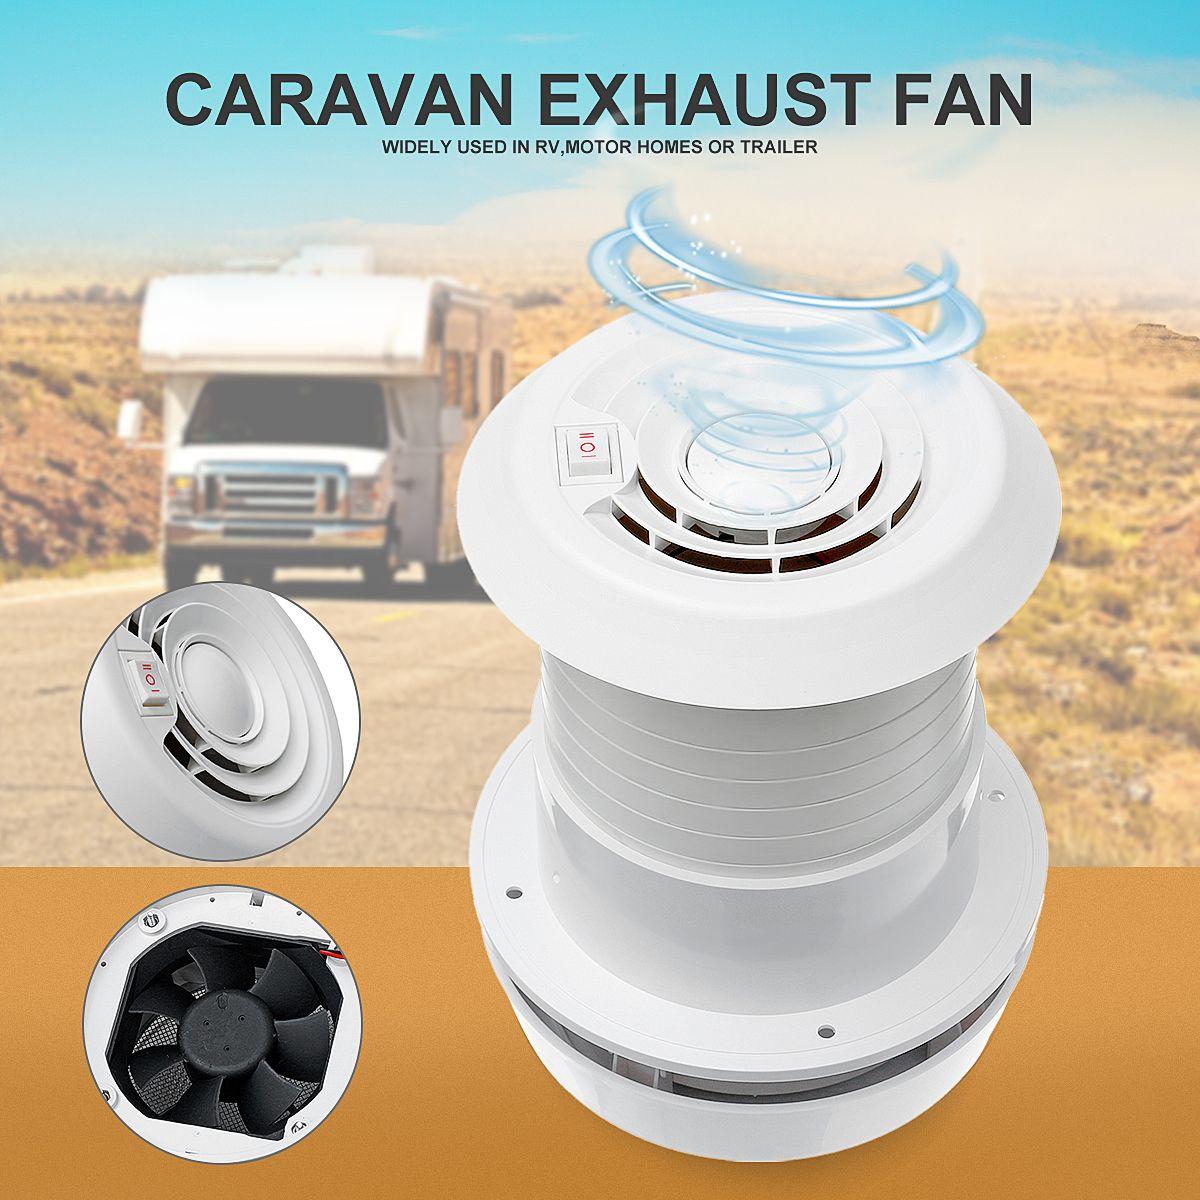 WARMTOO 1Pcs 12V RV Energy-saving Motorhome Roof Vent Ventilation Cooling Exhaust Fan Noiseless For Homes Trailer Travel Motor